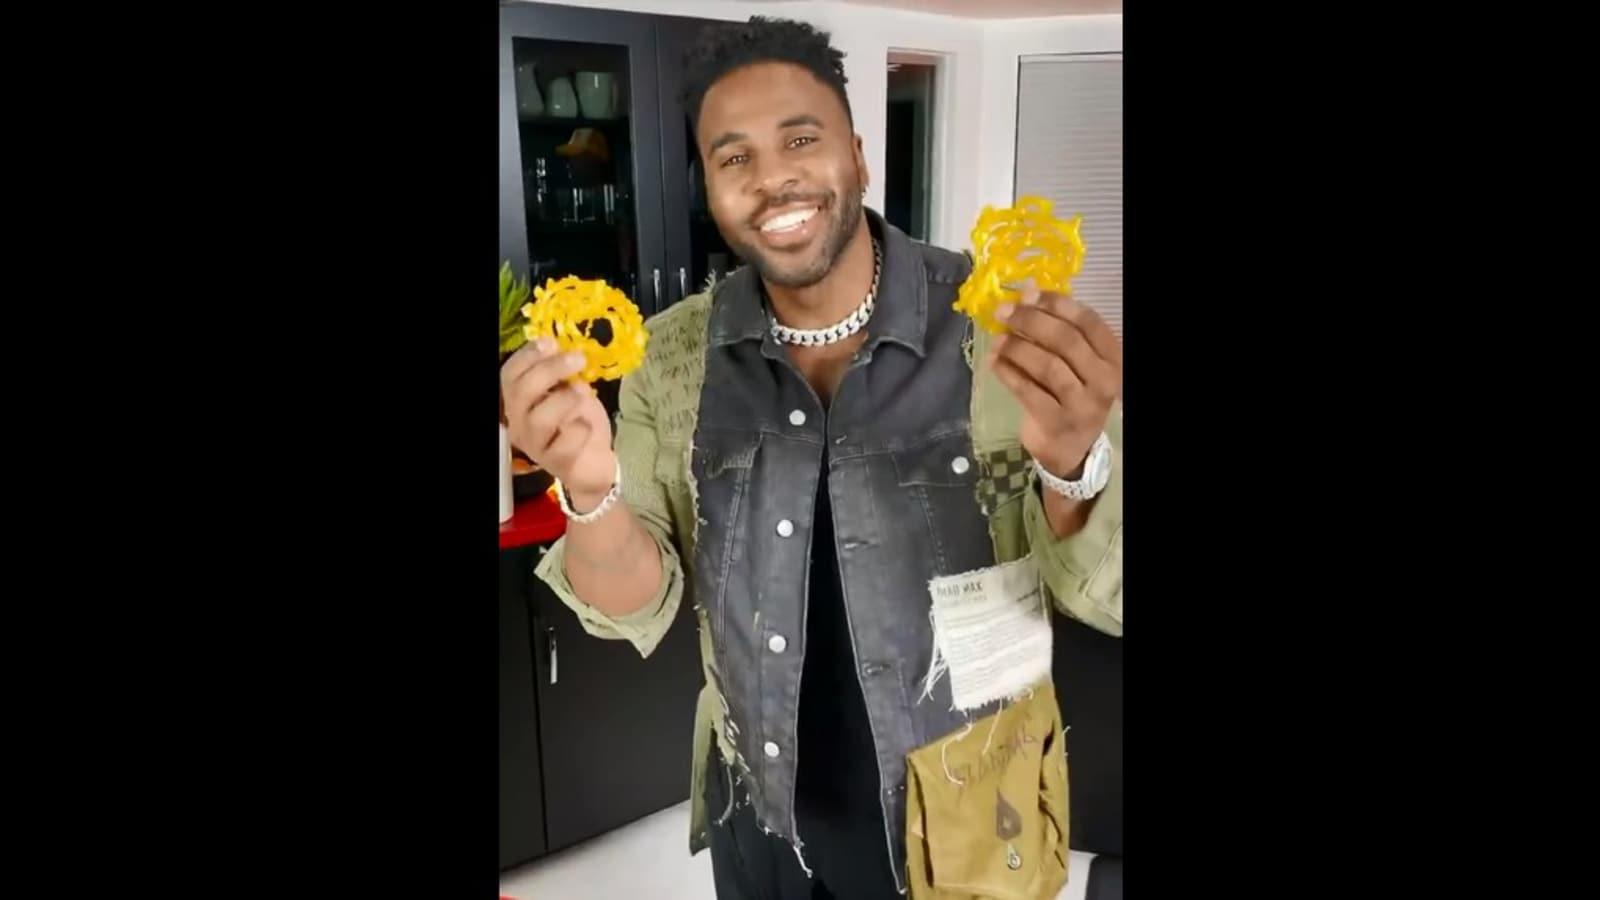 American singer Jason Derulo makes jalebis, people love the viral video - Hindustan Times